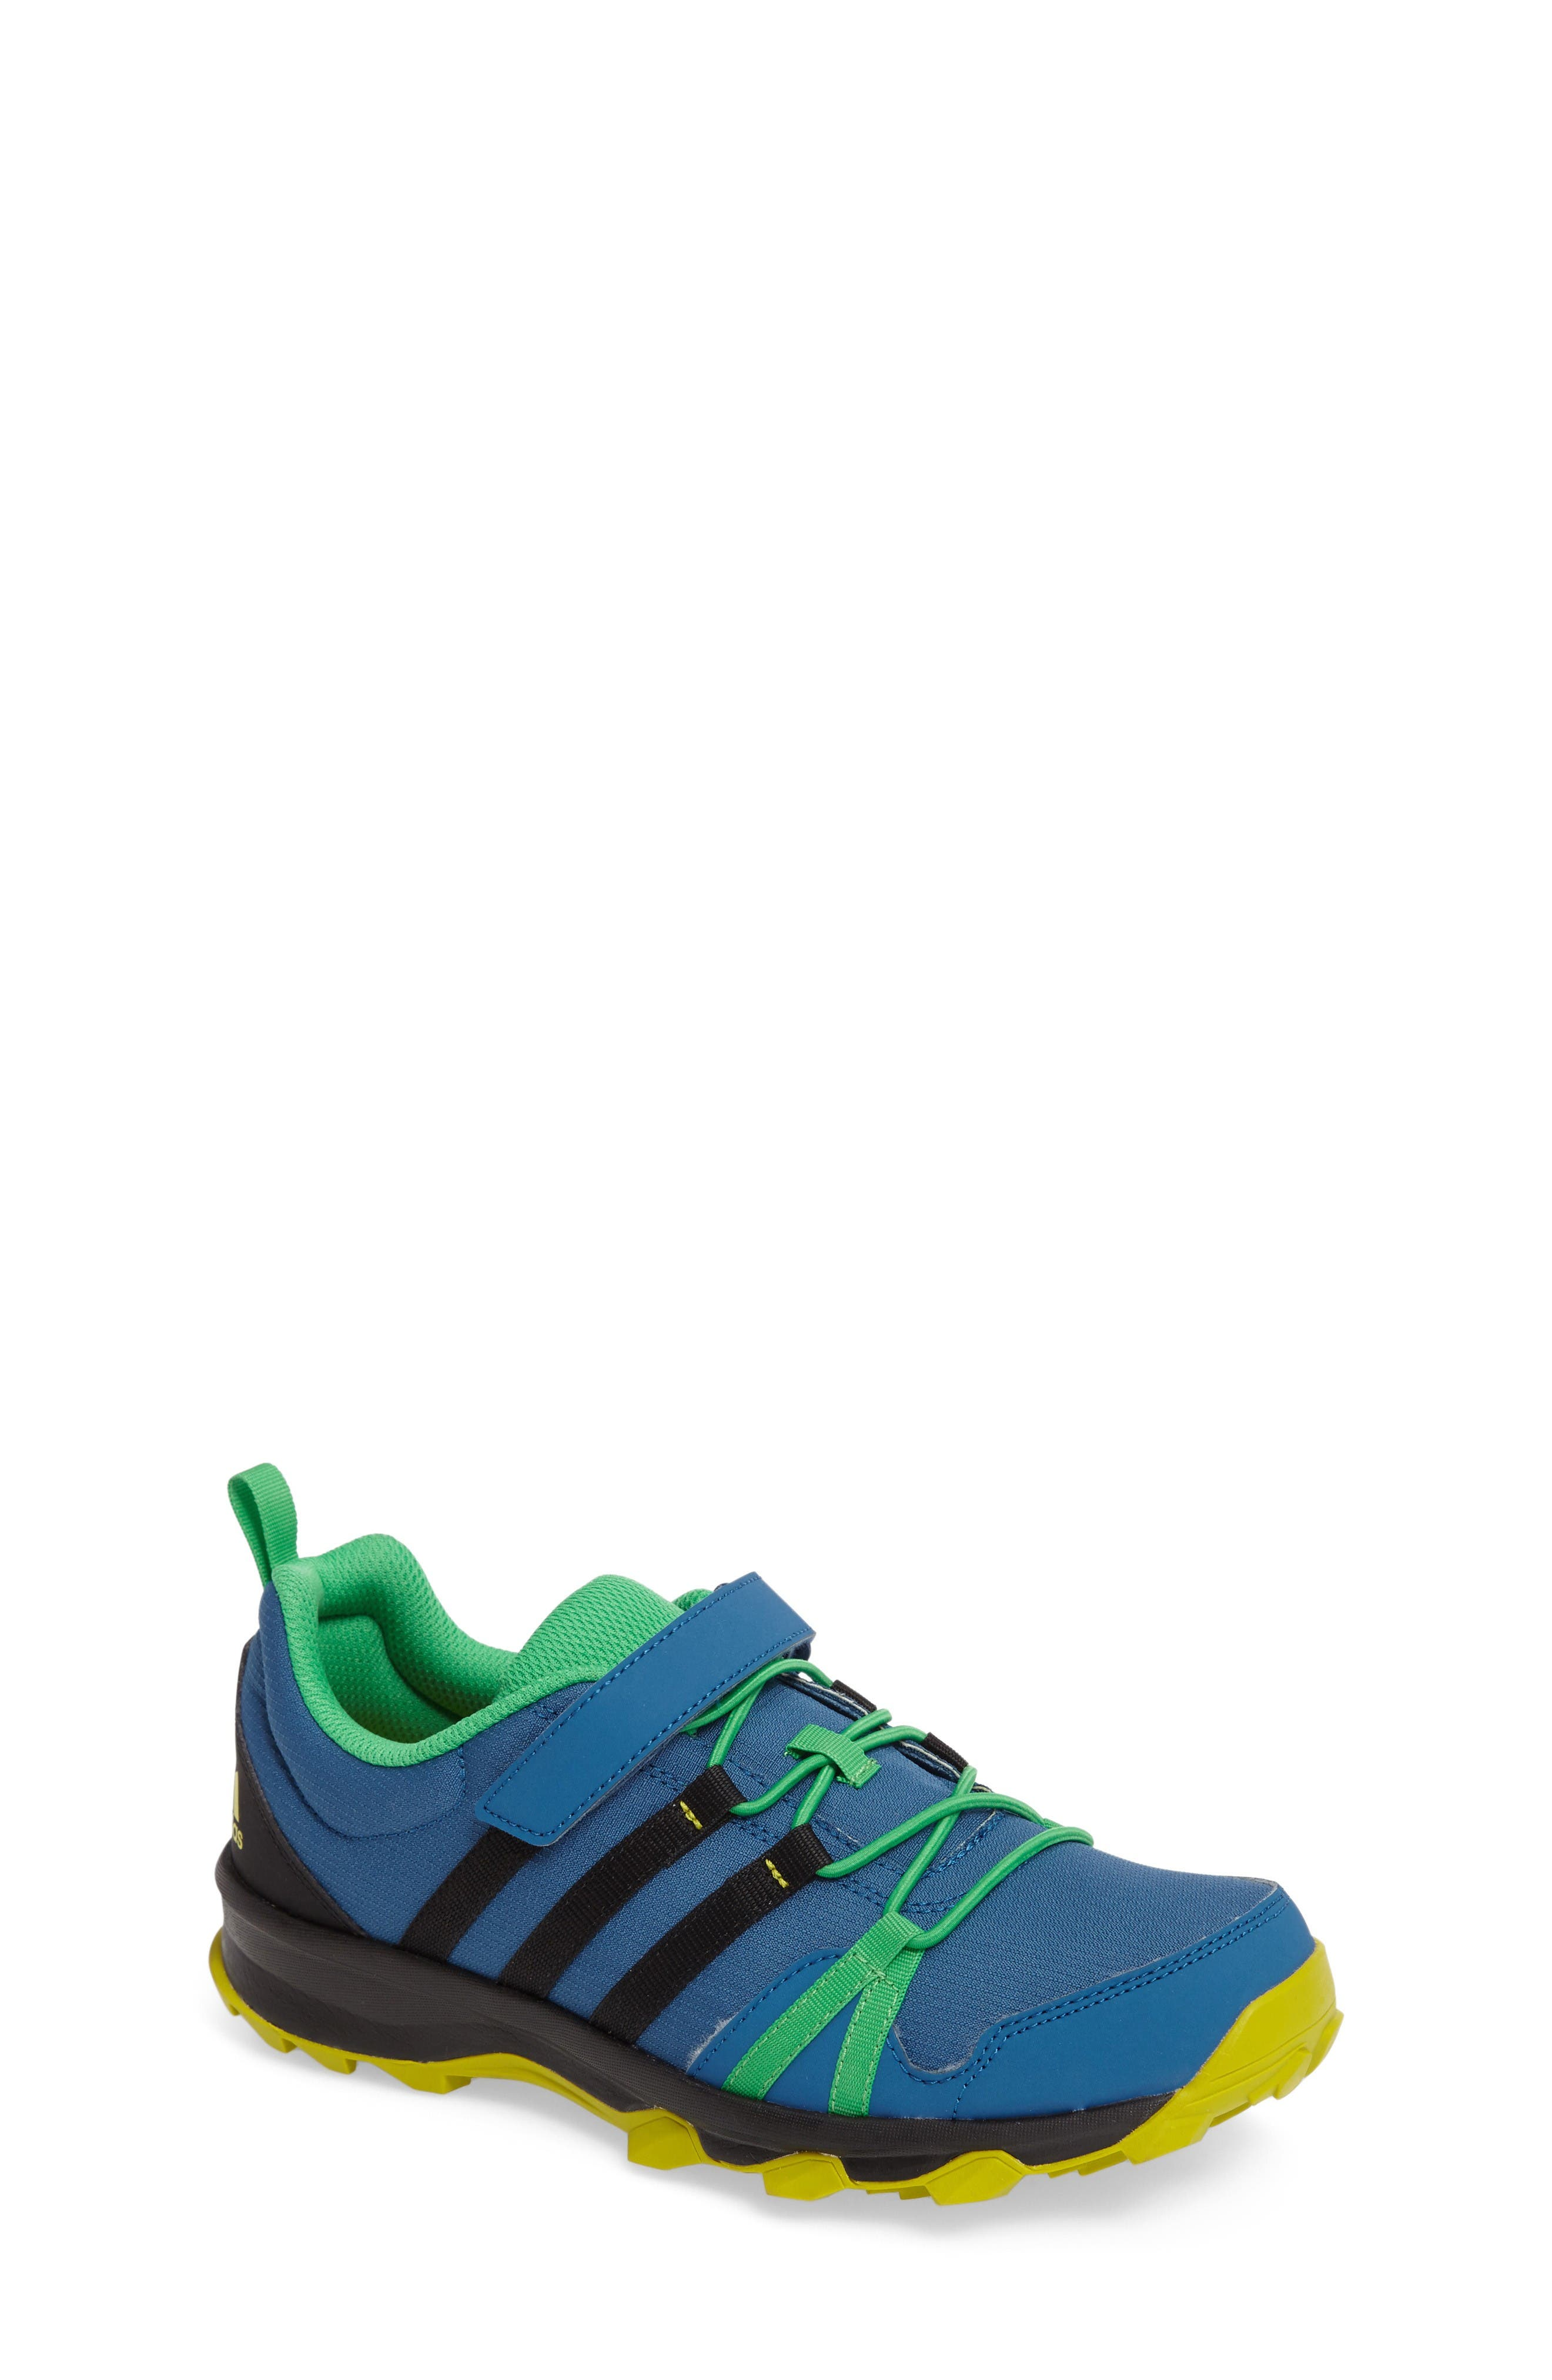 Main Image - adidas Tracerocker Sneaker (Toddler, Little Kid & Big Kid)